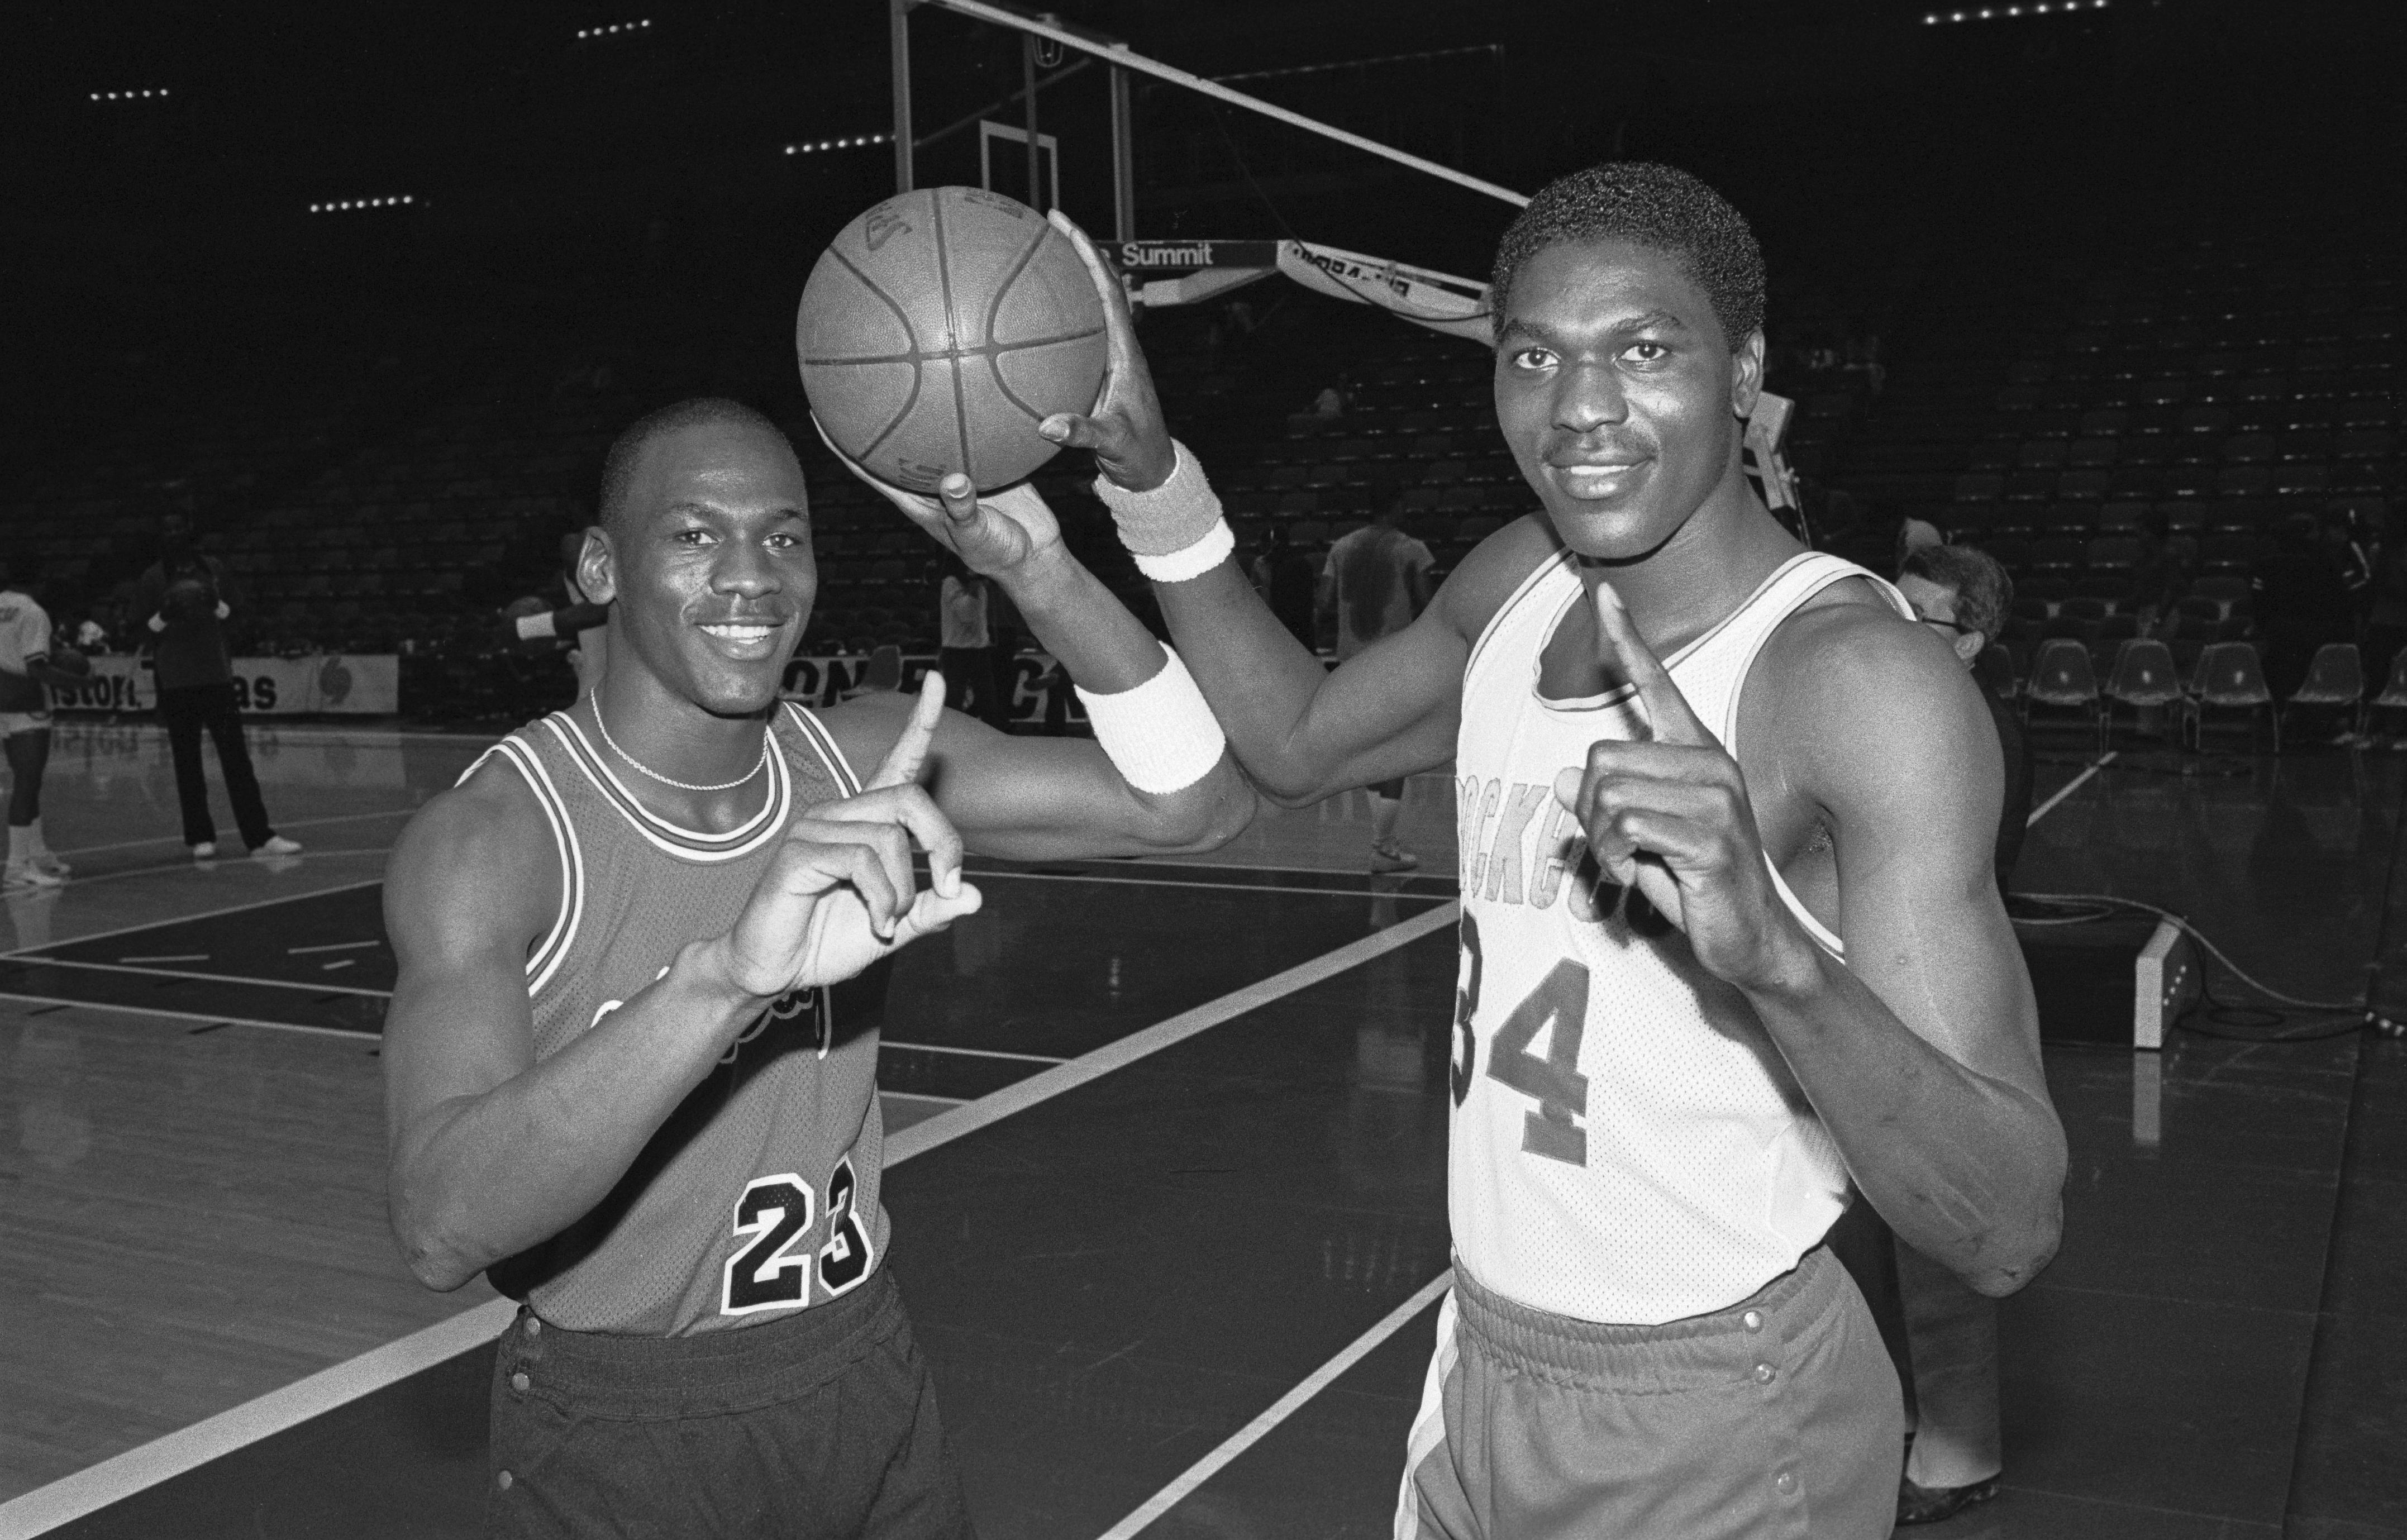 Michael Jordan and Akeem Olajuwon in Rookie Seasons